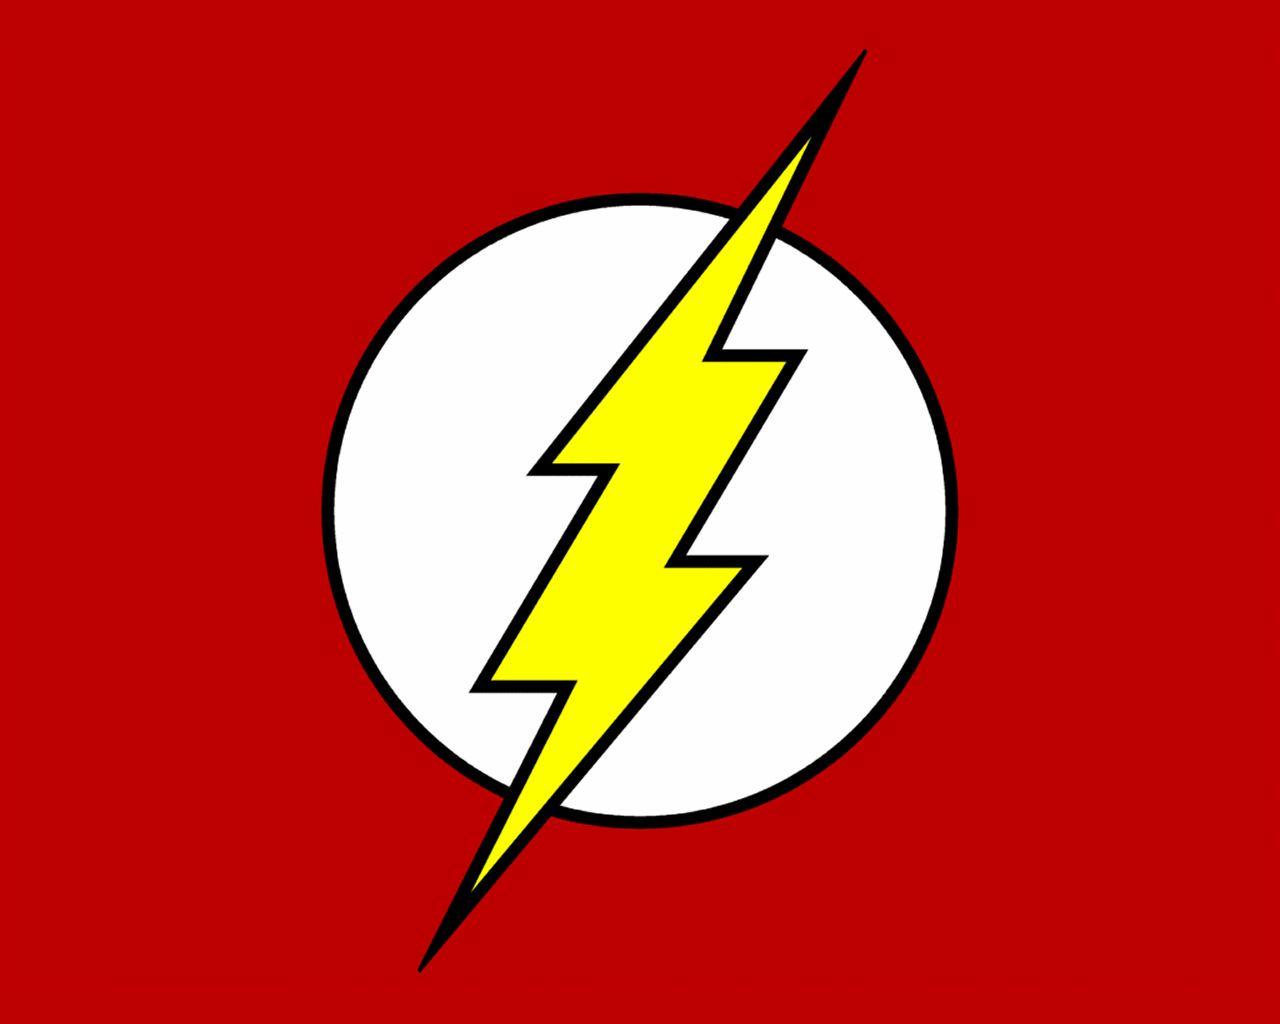 The Flash symbol.